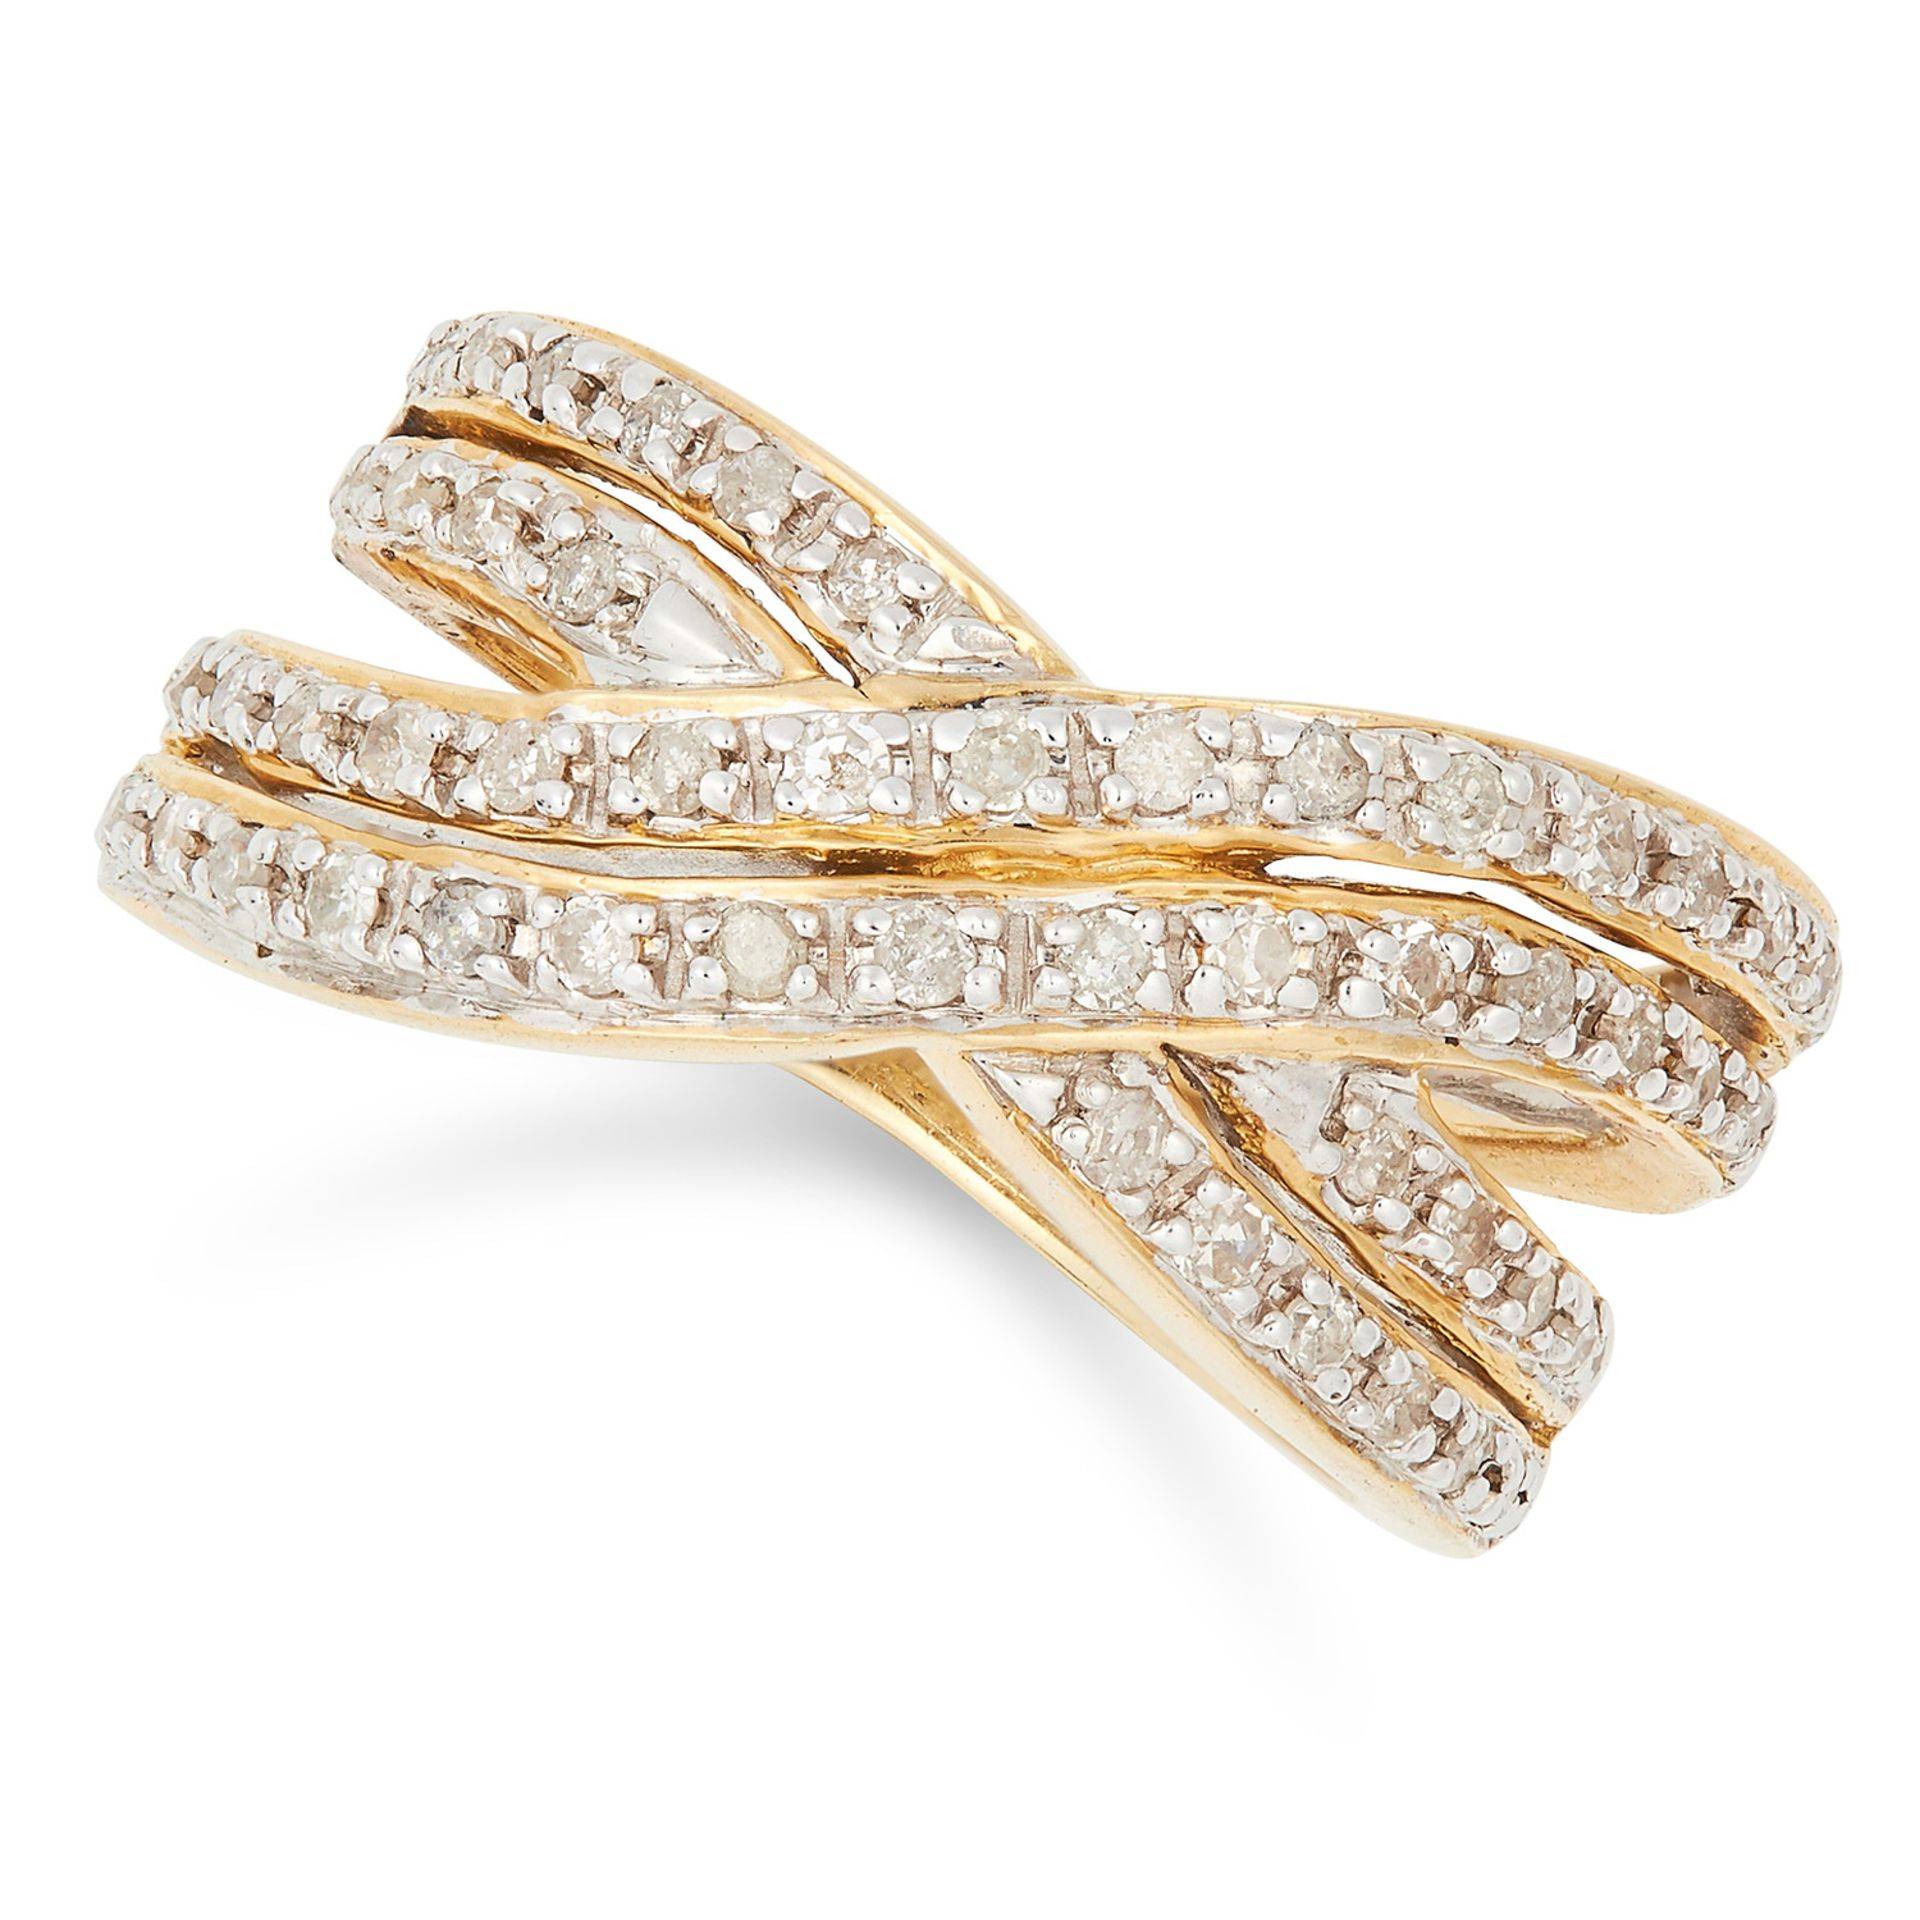 DIAMOND CROSS OVER RING, set with round cut diamonds, size L / 5.5, 6.7g.